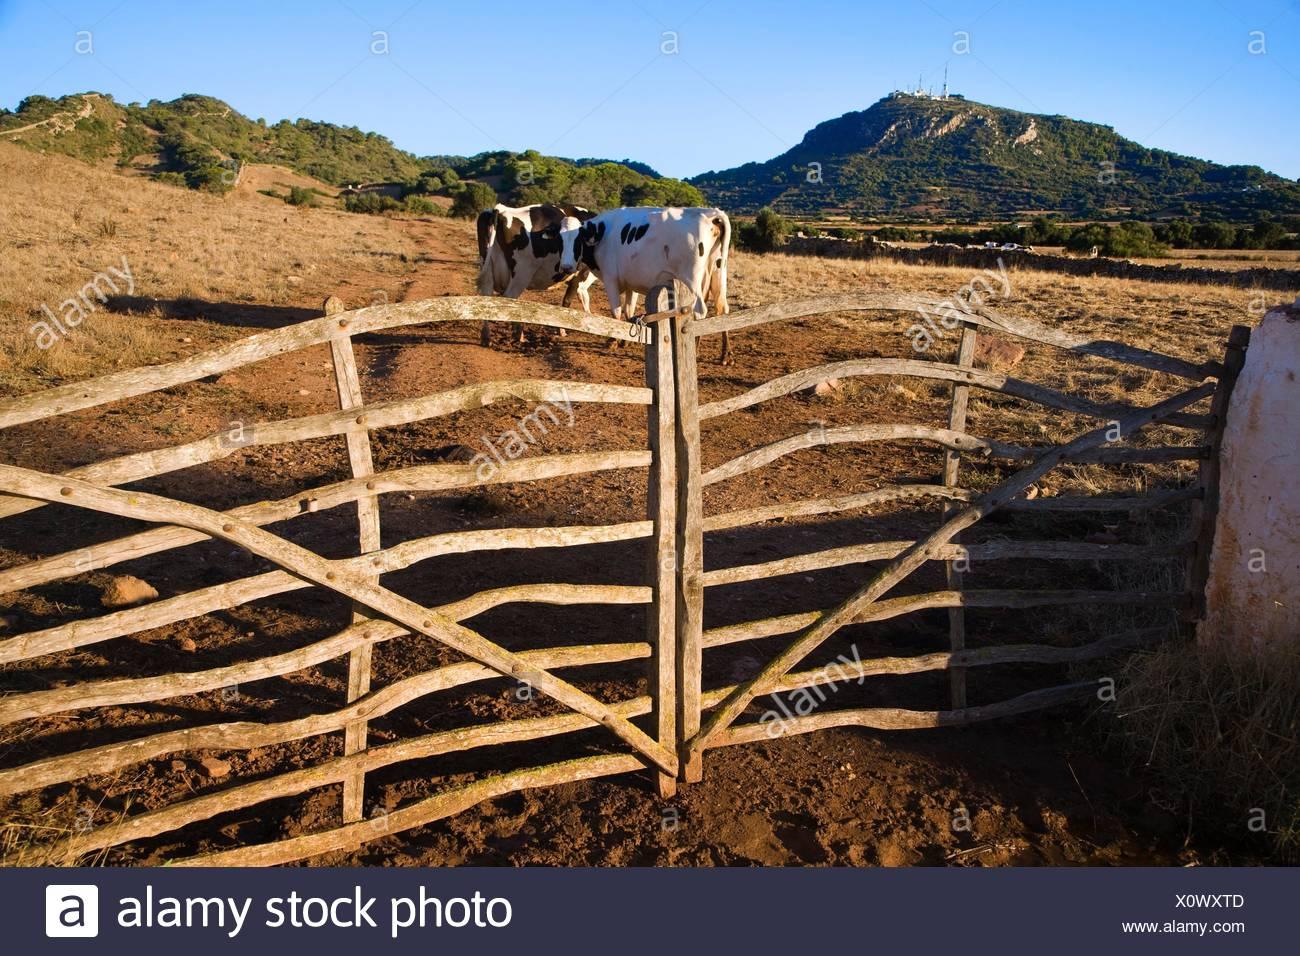 Cows in Cami den Kane Monte Toro in background Menorca 1300x956